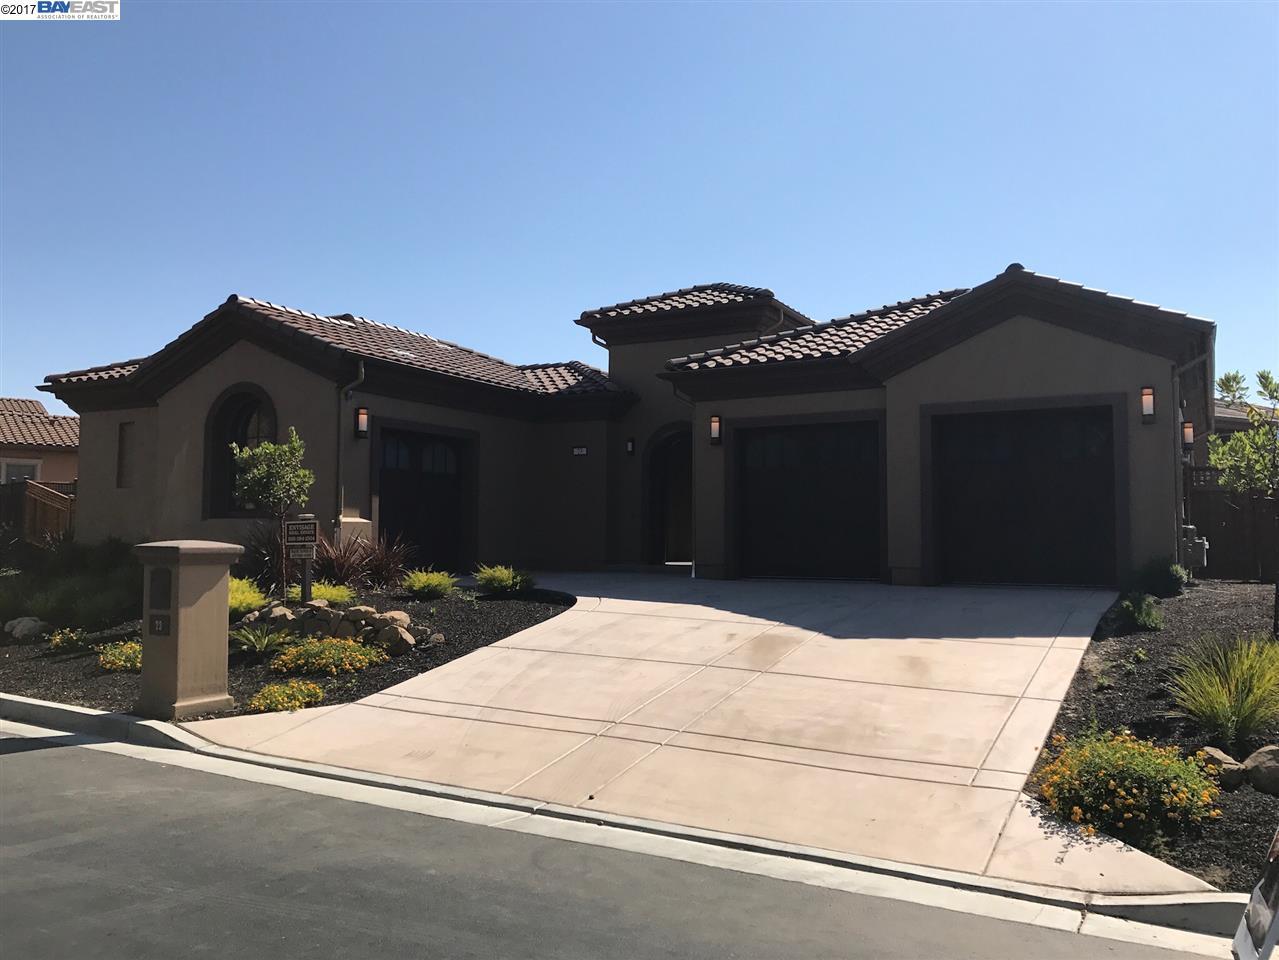 23 Stonebrae Road, HAYWARD HILLS, CA 94542